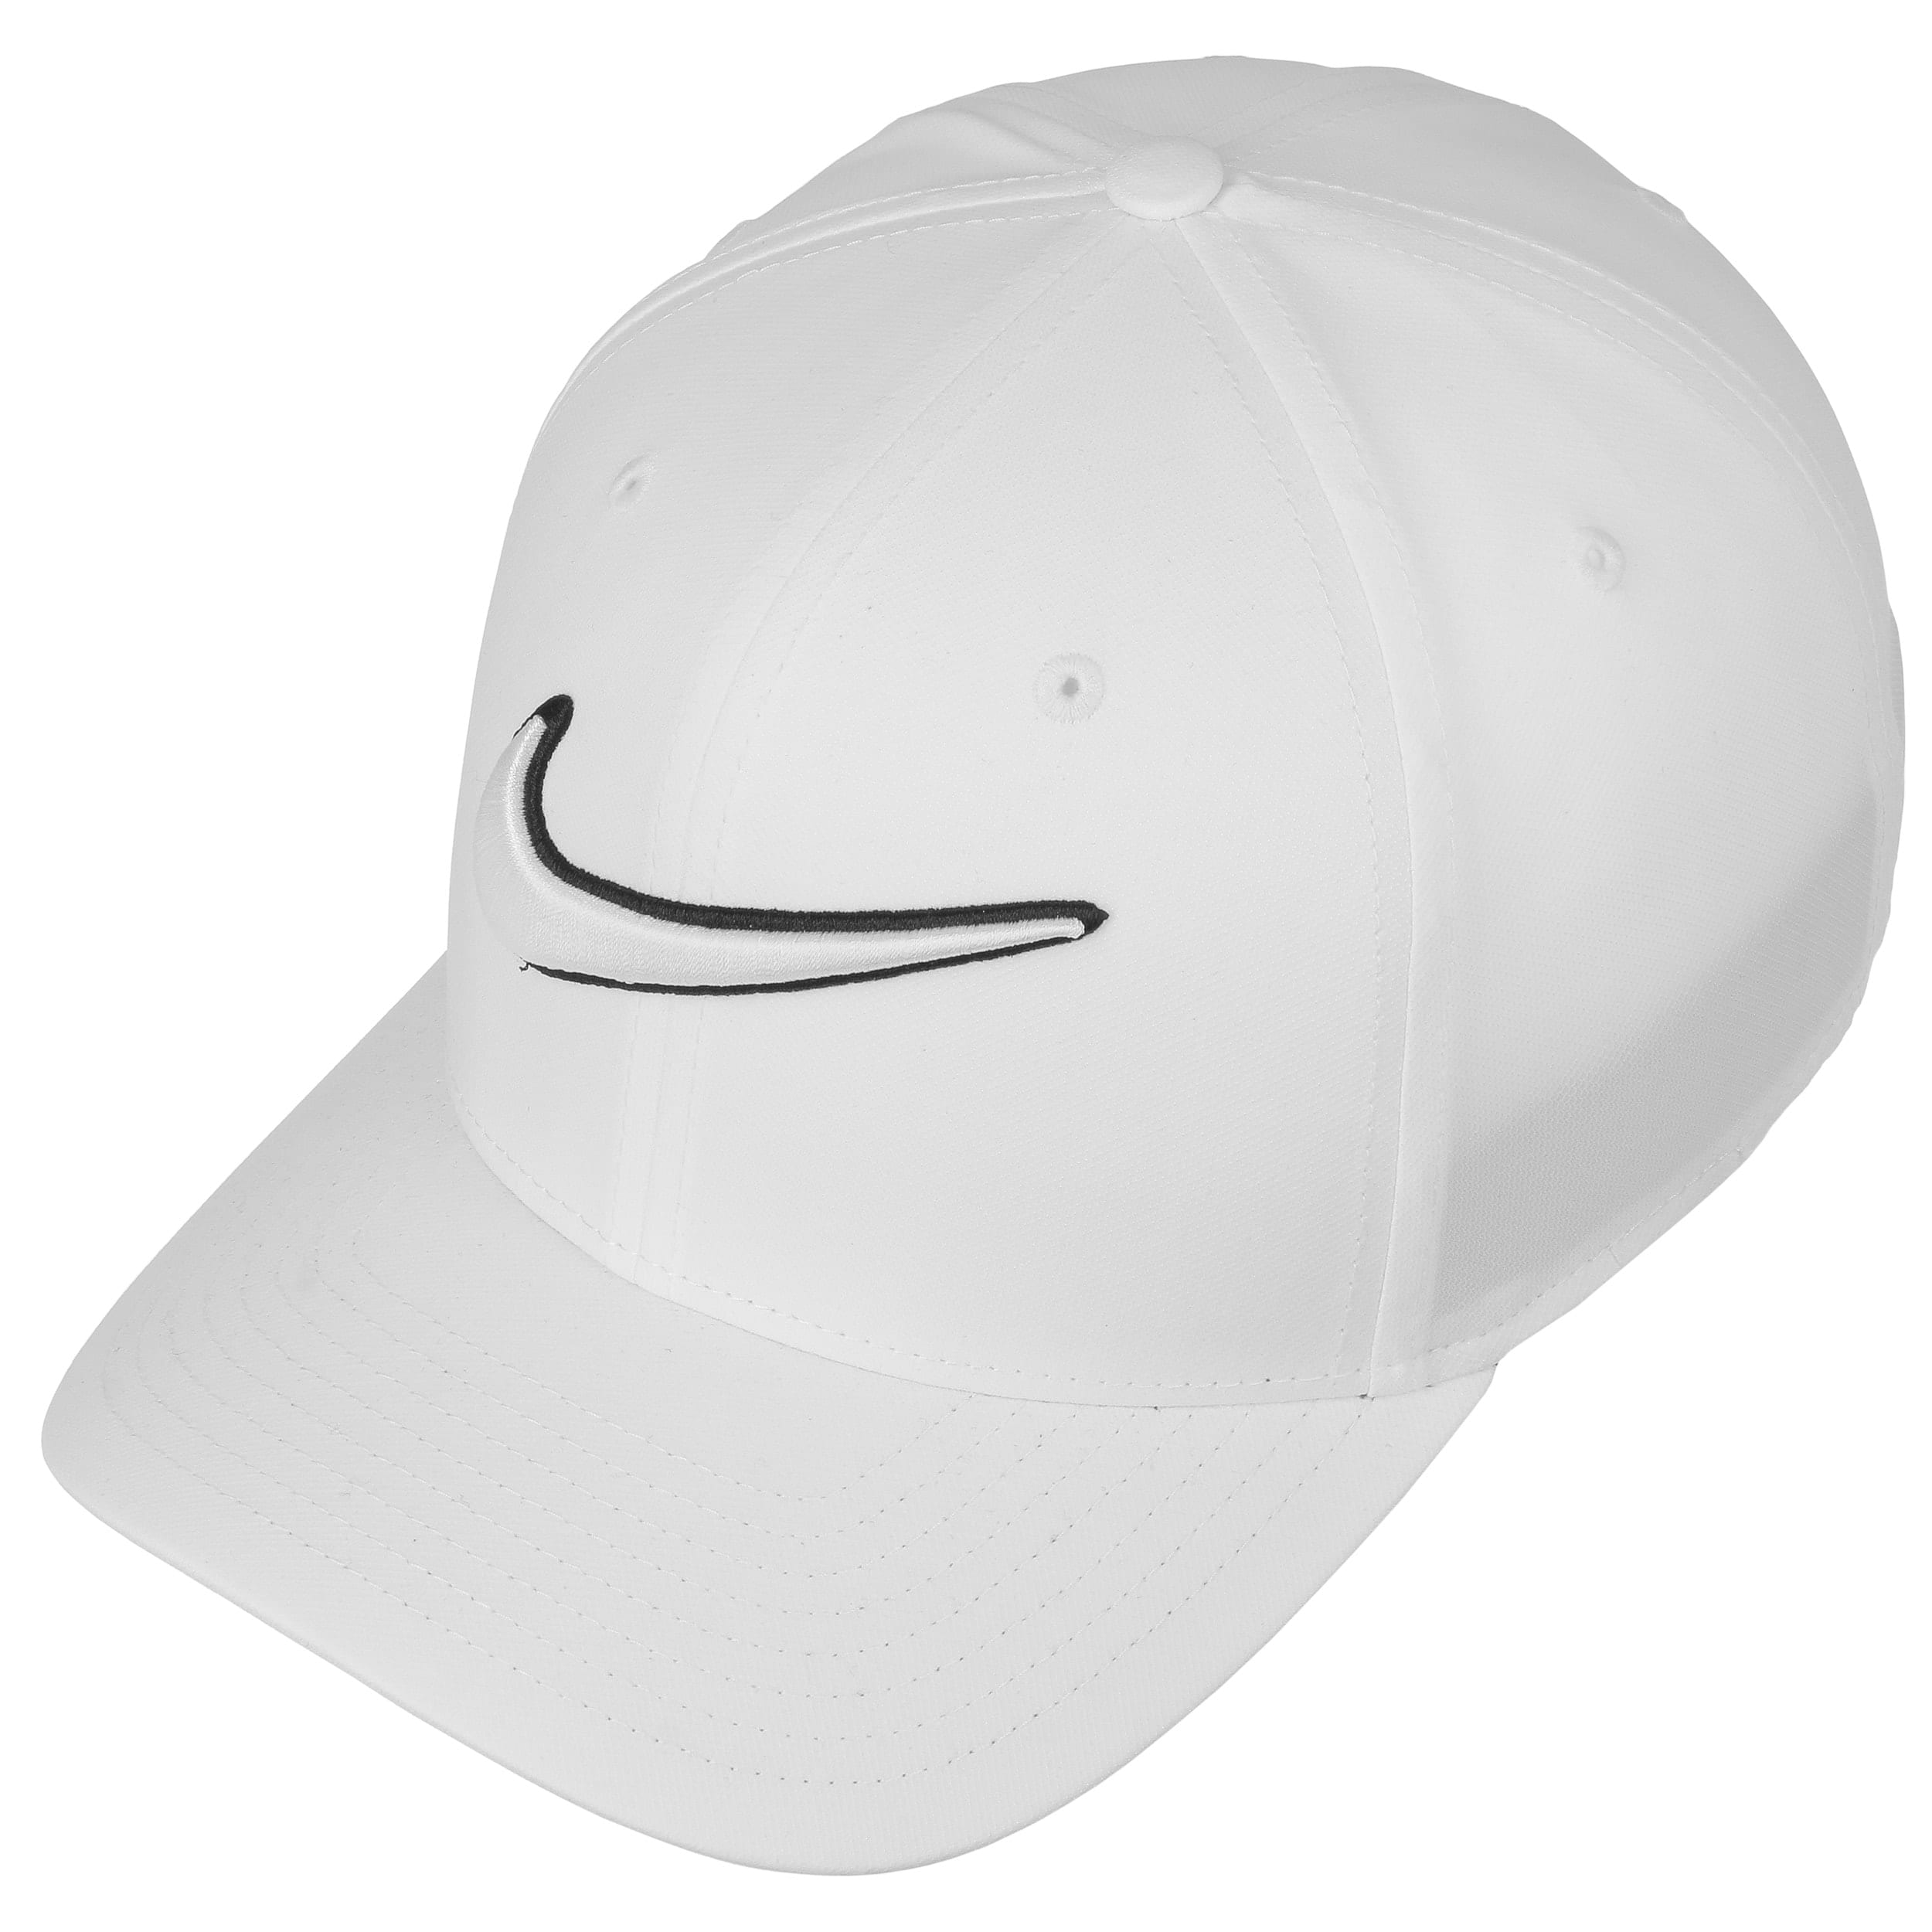 c8cadd62f35 Golf Classic 99 Performance Pet by Nike, EUR 29,95 --> Hoeden ...